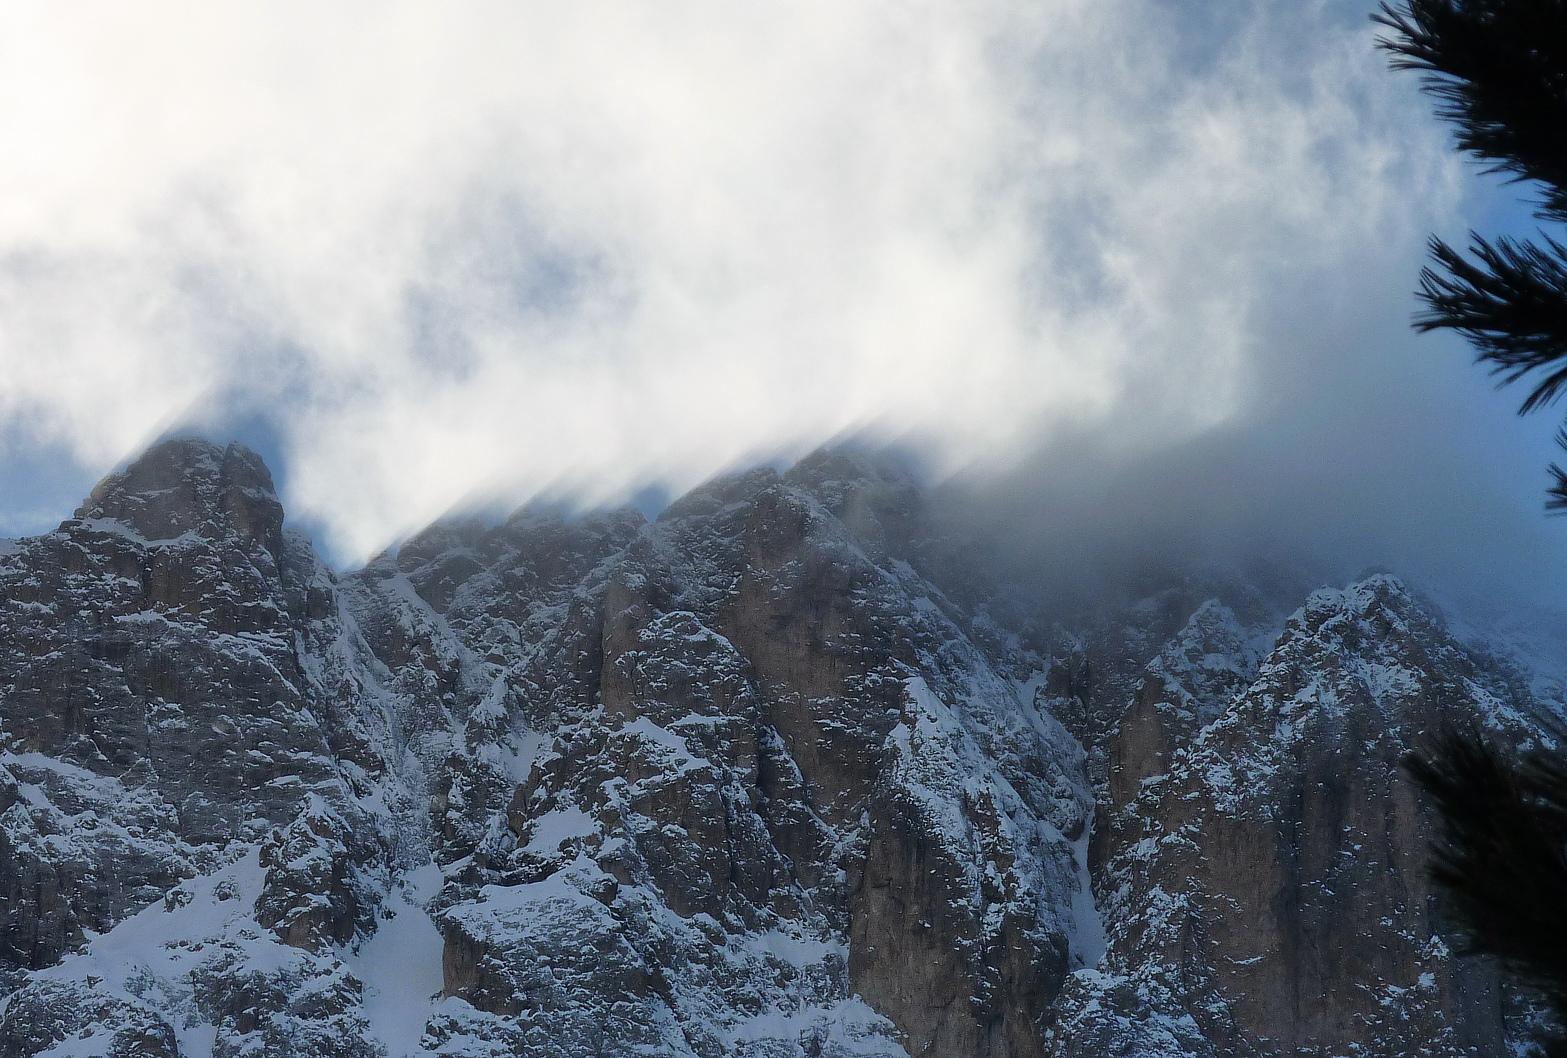 Schattenstrahlen am Langkofelgrat - Dolomiten